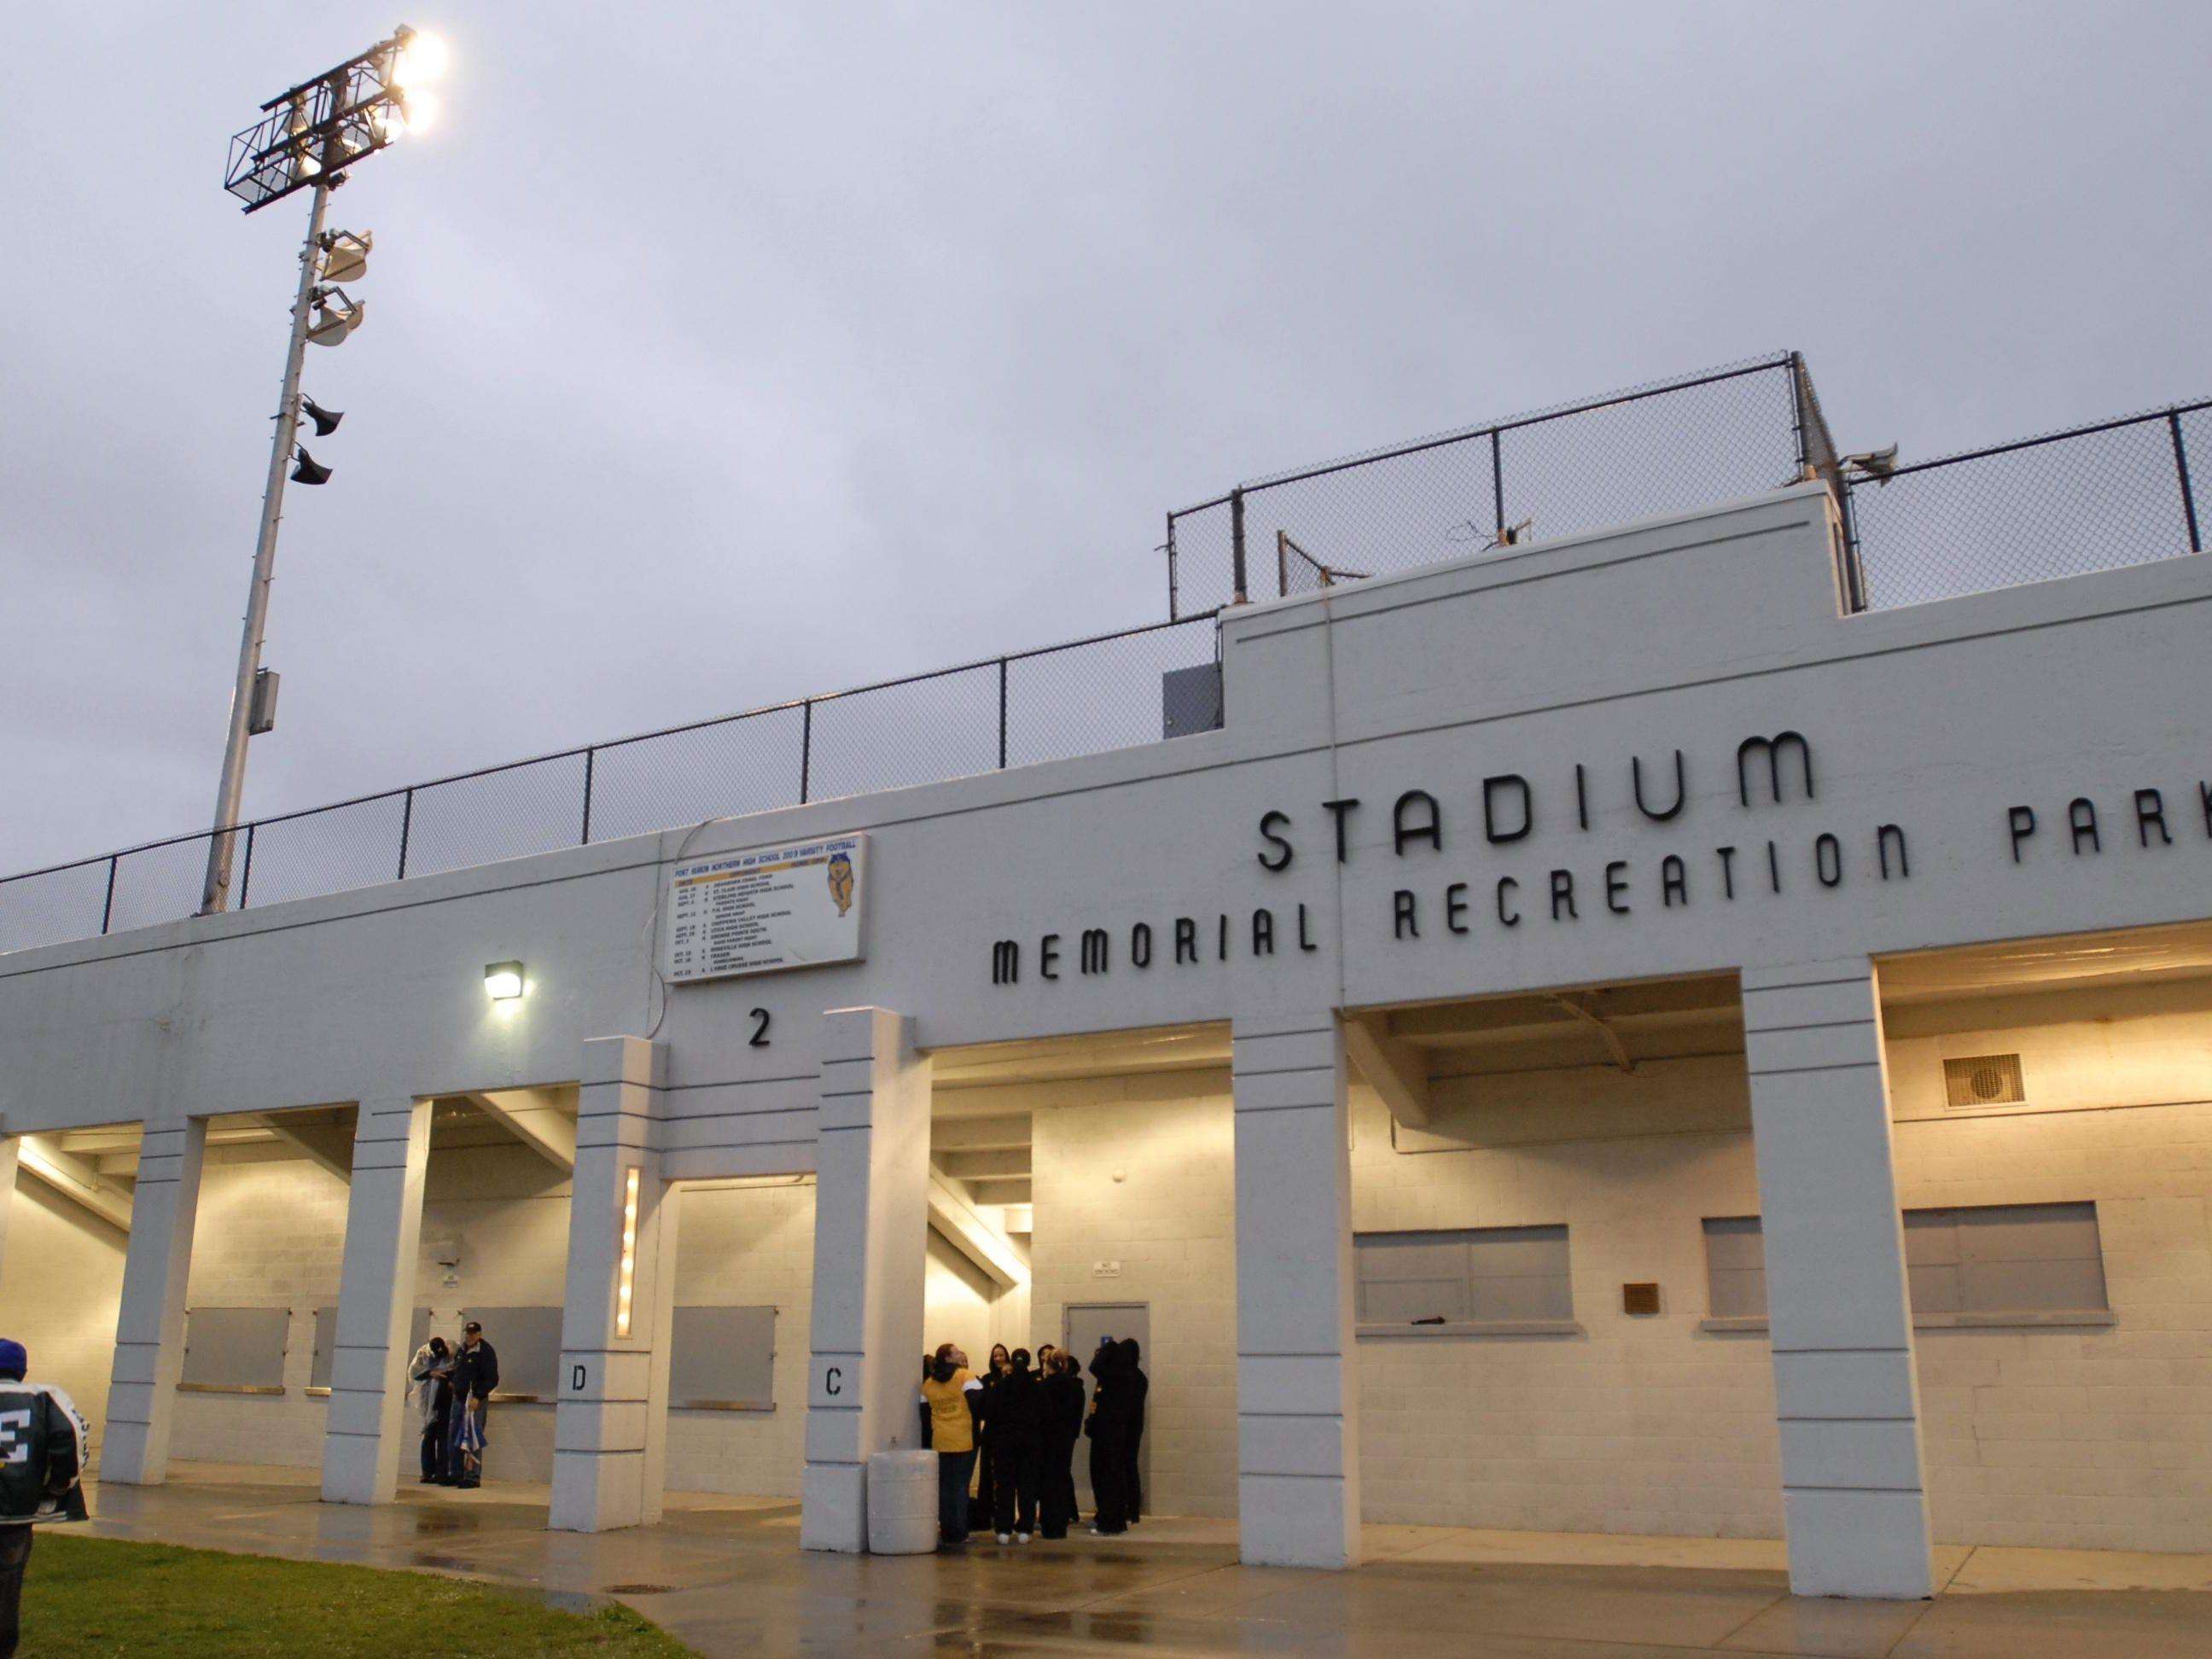 Memorial Stadium will host the PoHo Pond Hockey Classic Jan. 29, 30 and 31.